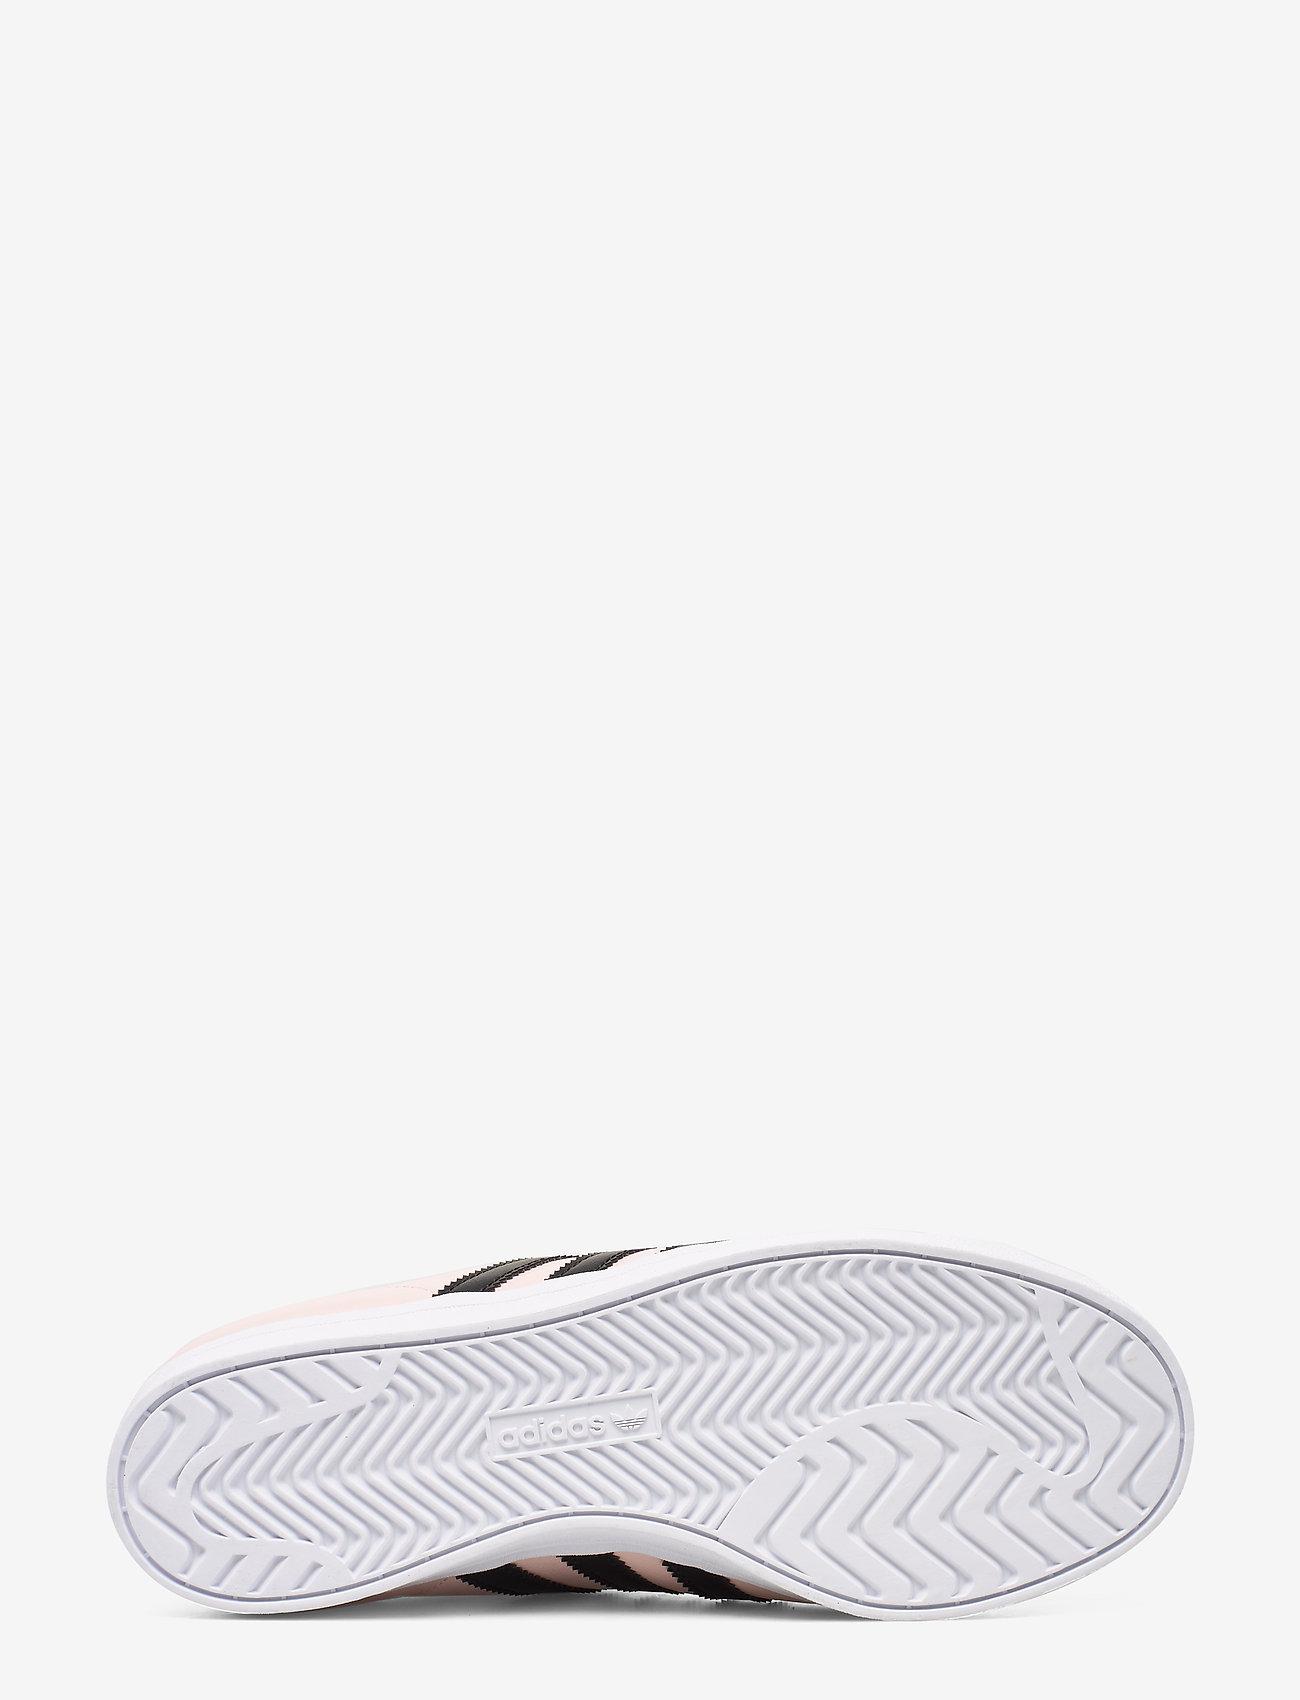 Coast Star W (Icepnk/cblack/ftwwht) - adidas Originals